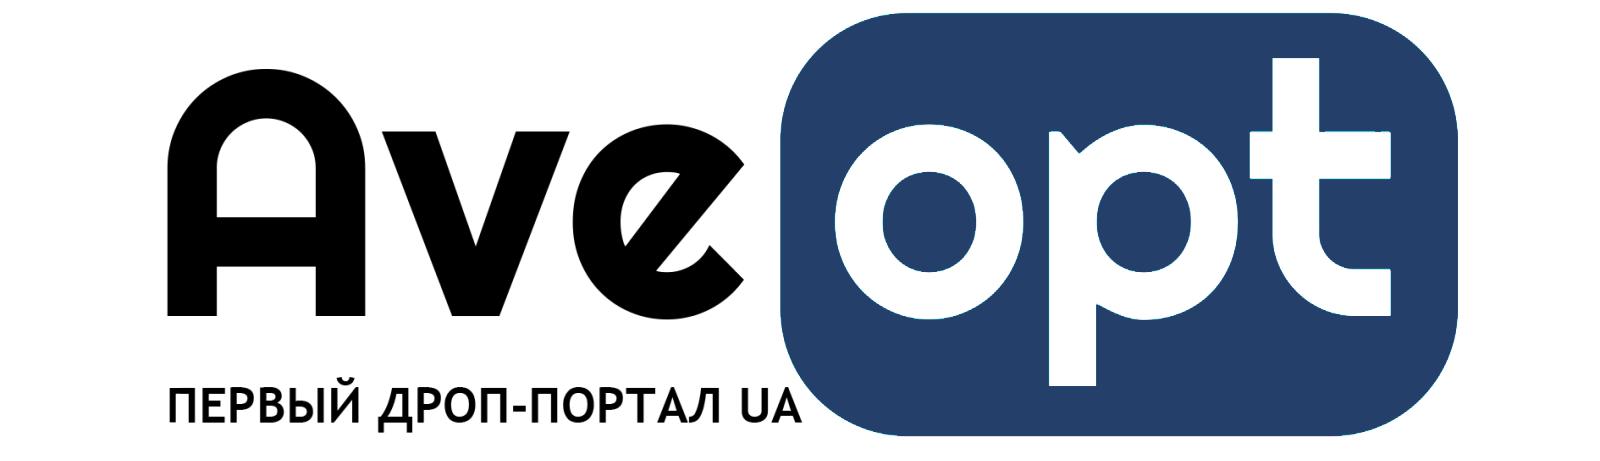 Aveopt – оптовая дропшиппинг платформа в Украине